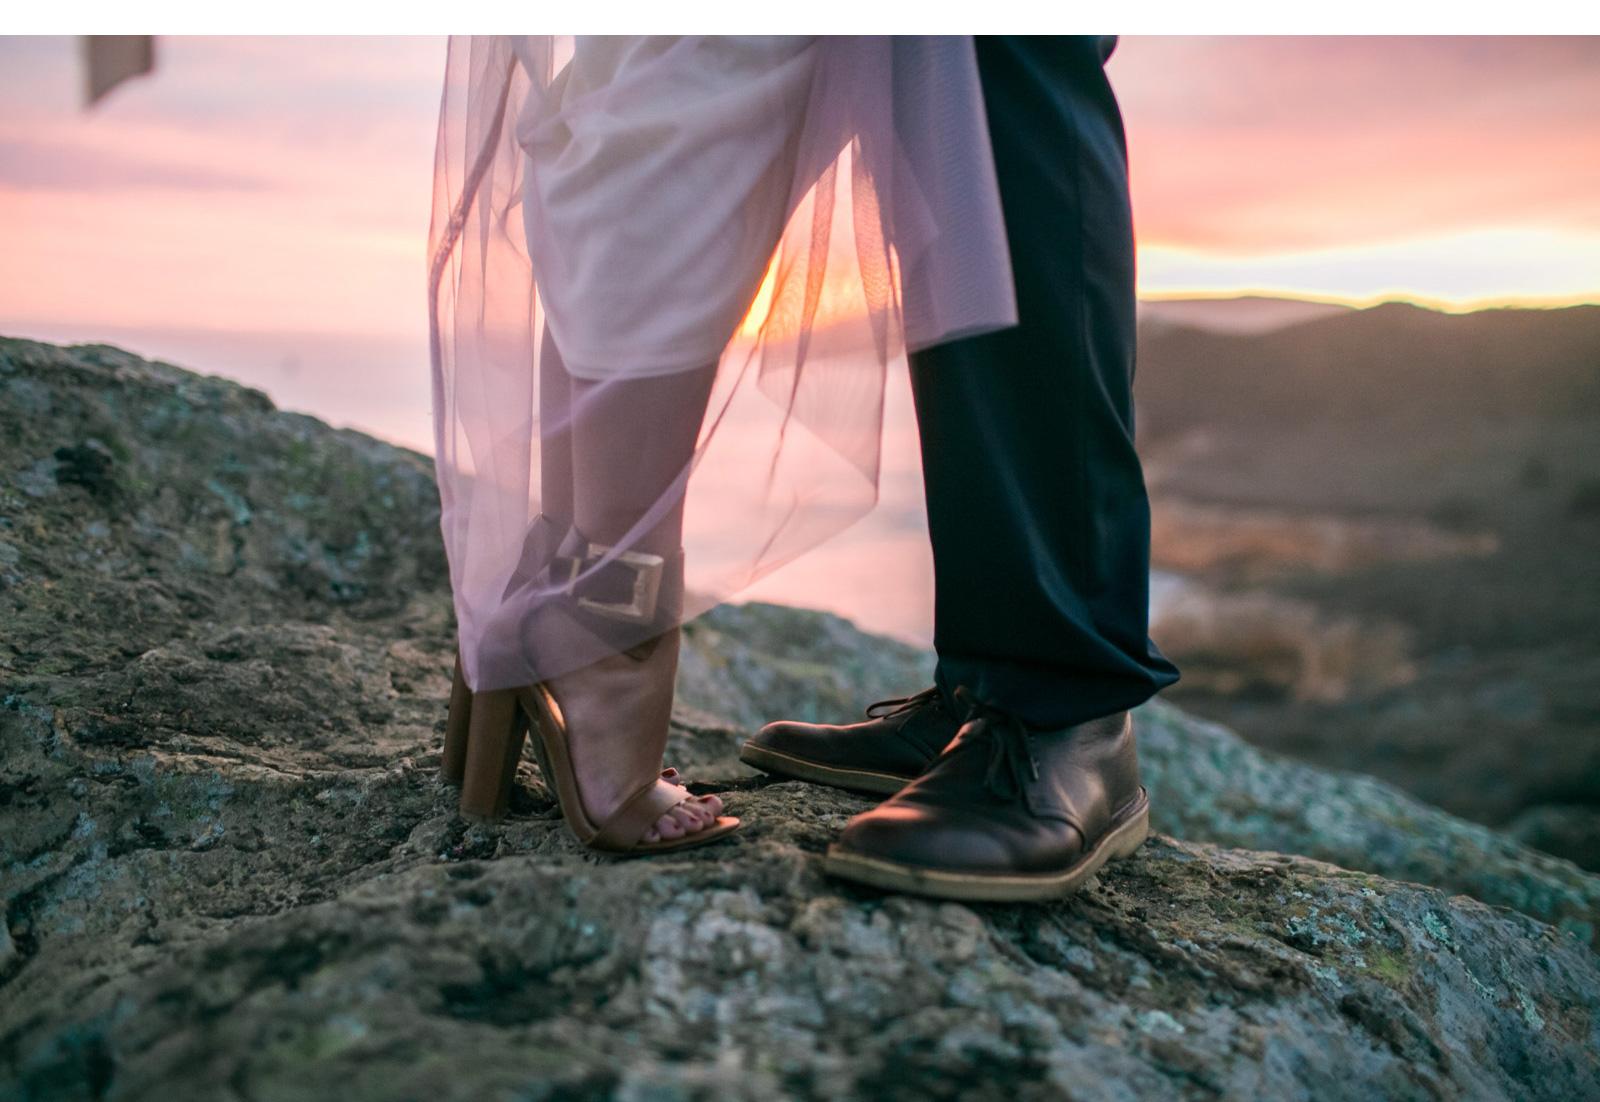 Central-Coast-Wedding-Photographer-Natalie-Schutt-Photography_06.jpg